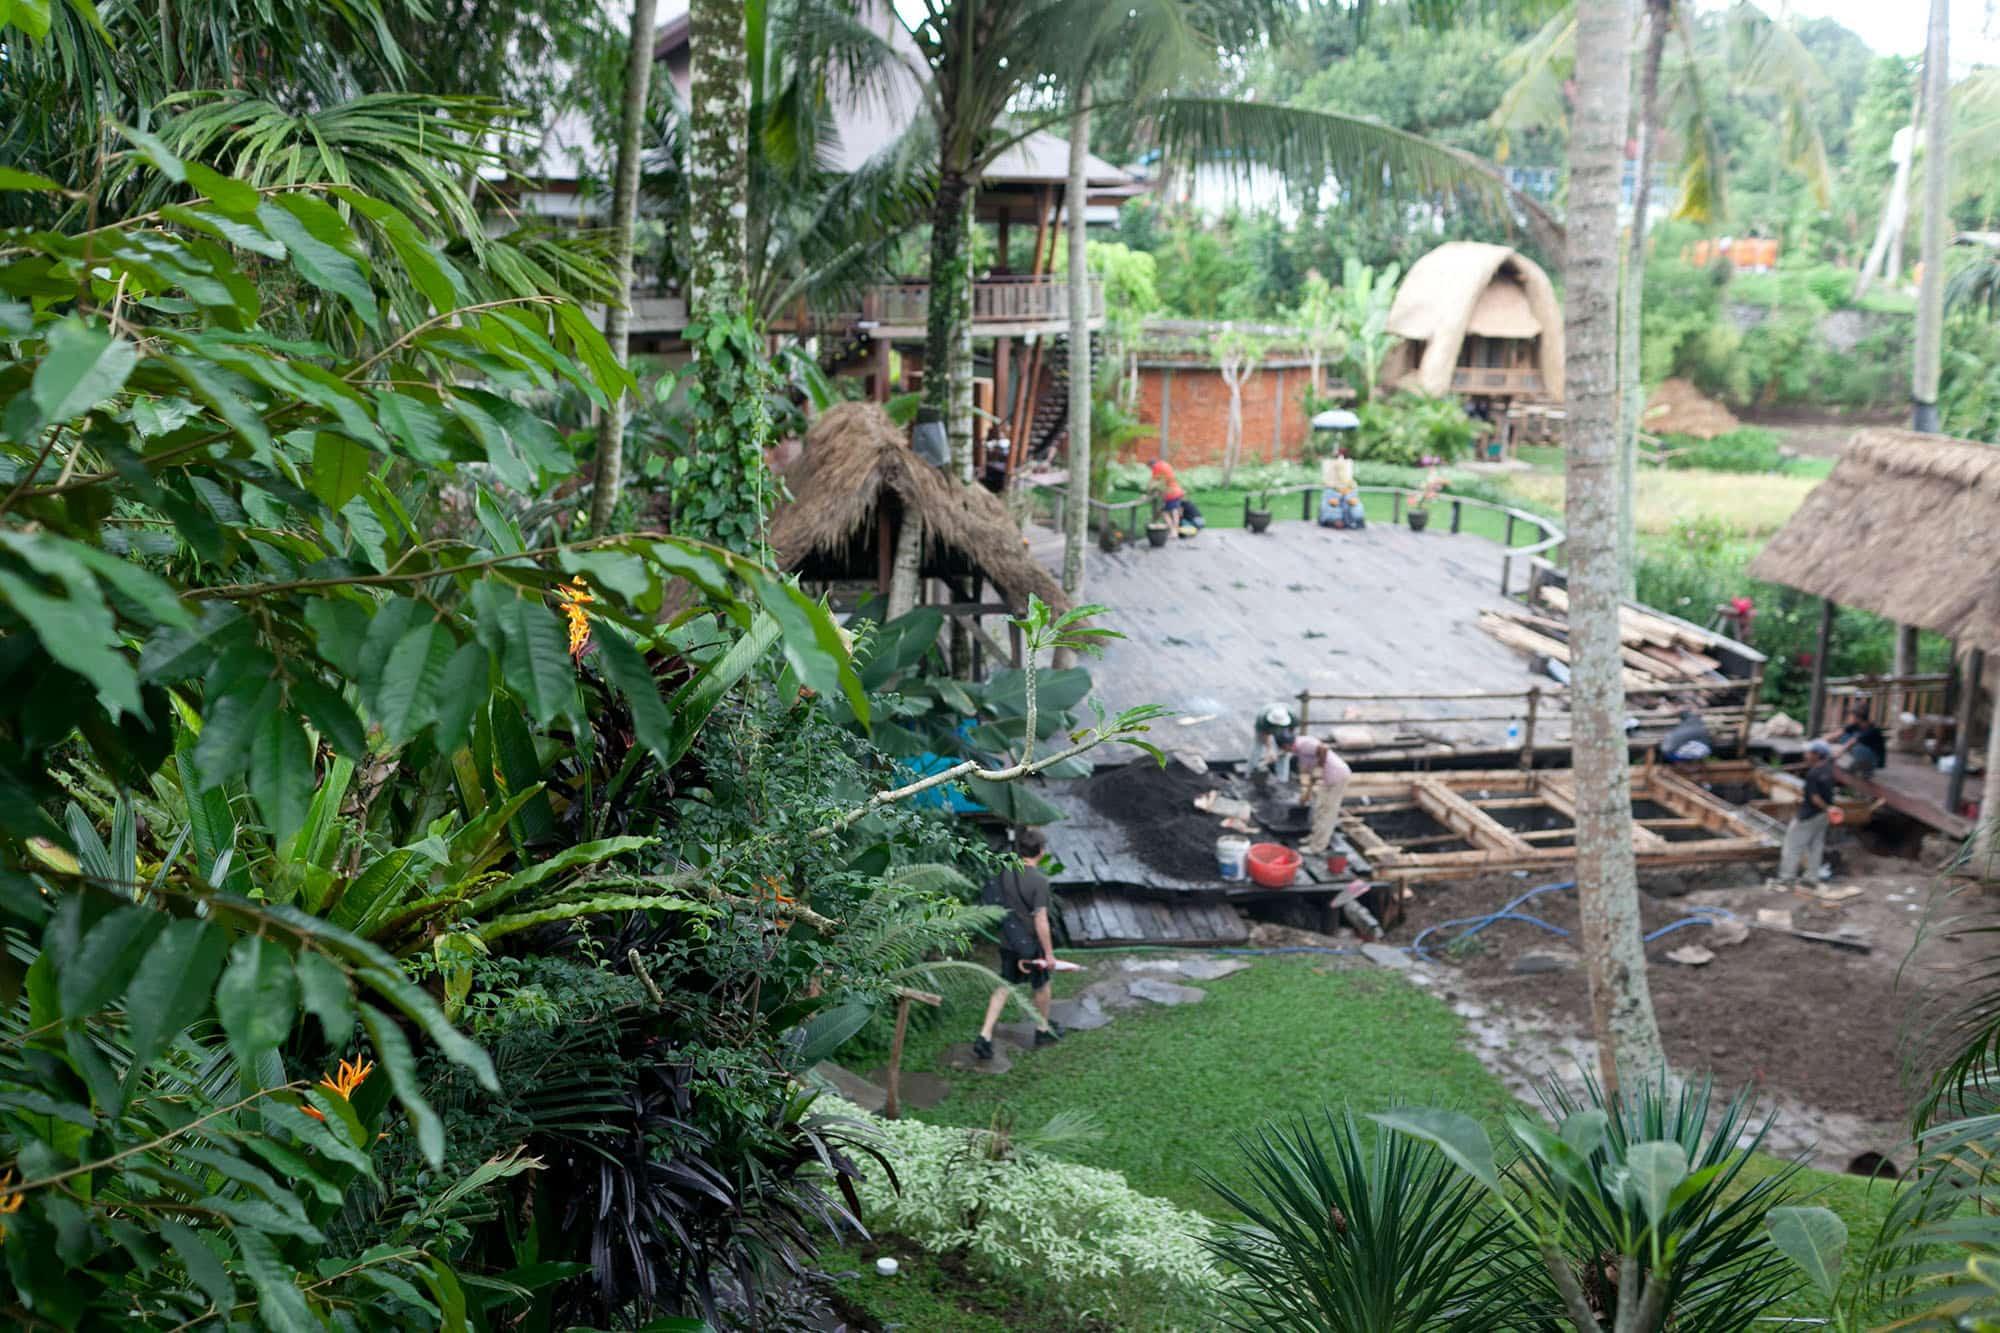 Intro to yoga class at yogabarn in Ubud, Bali, Indonesia.